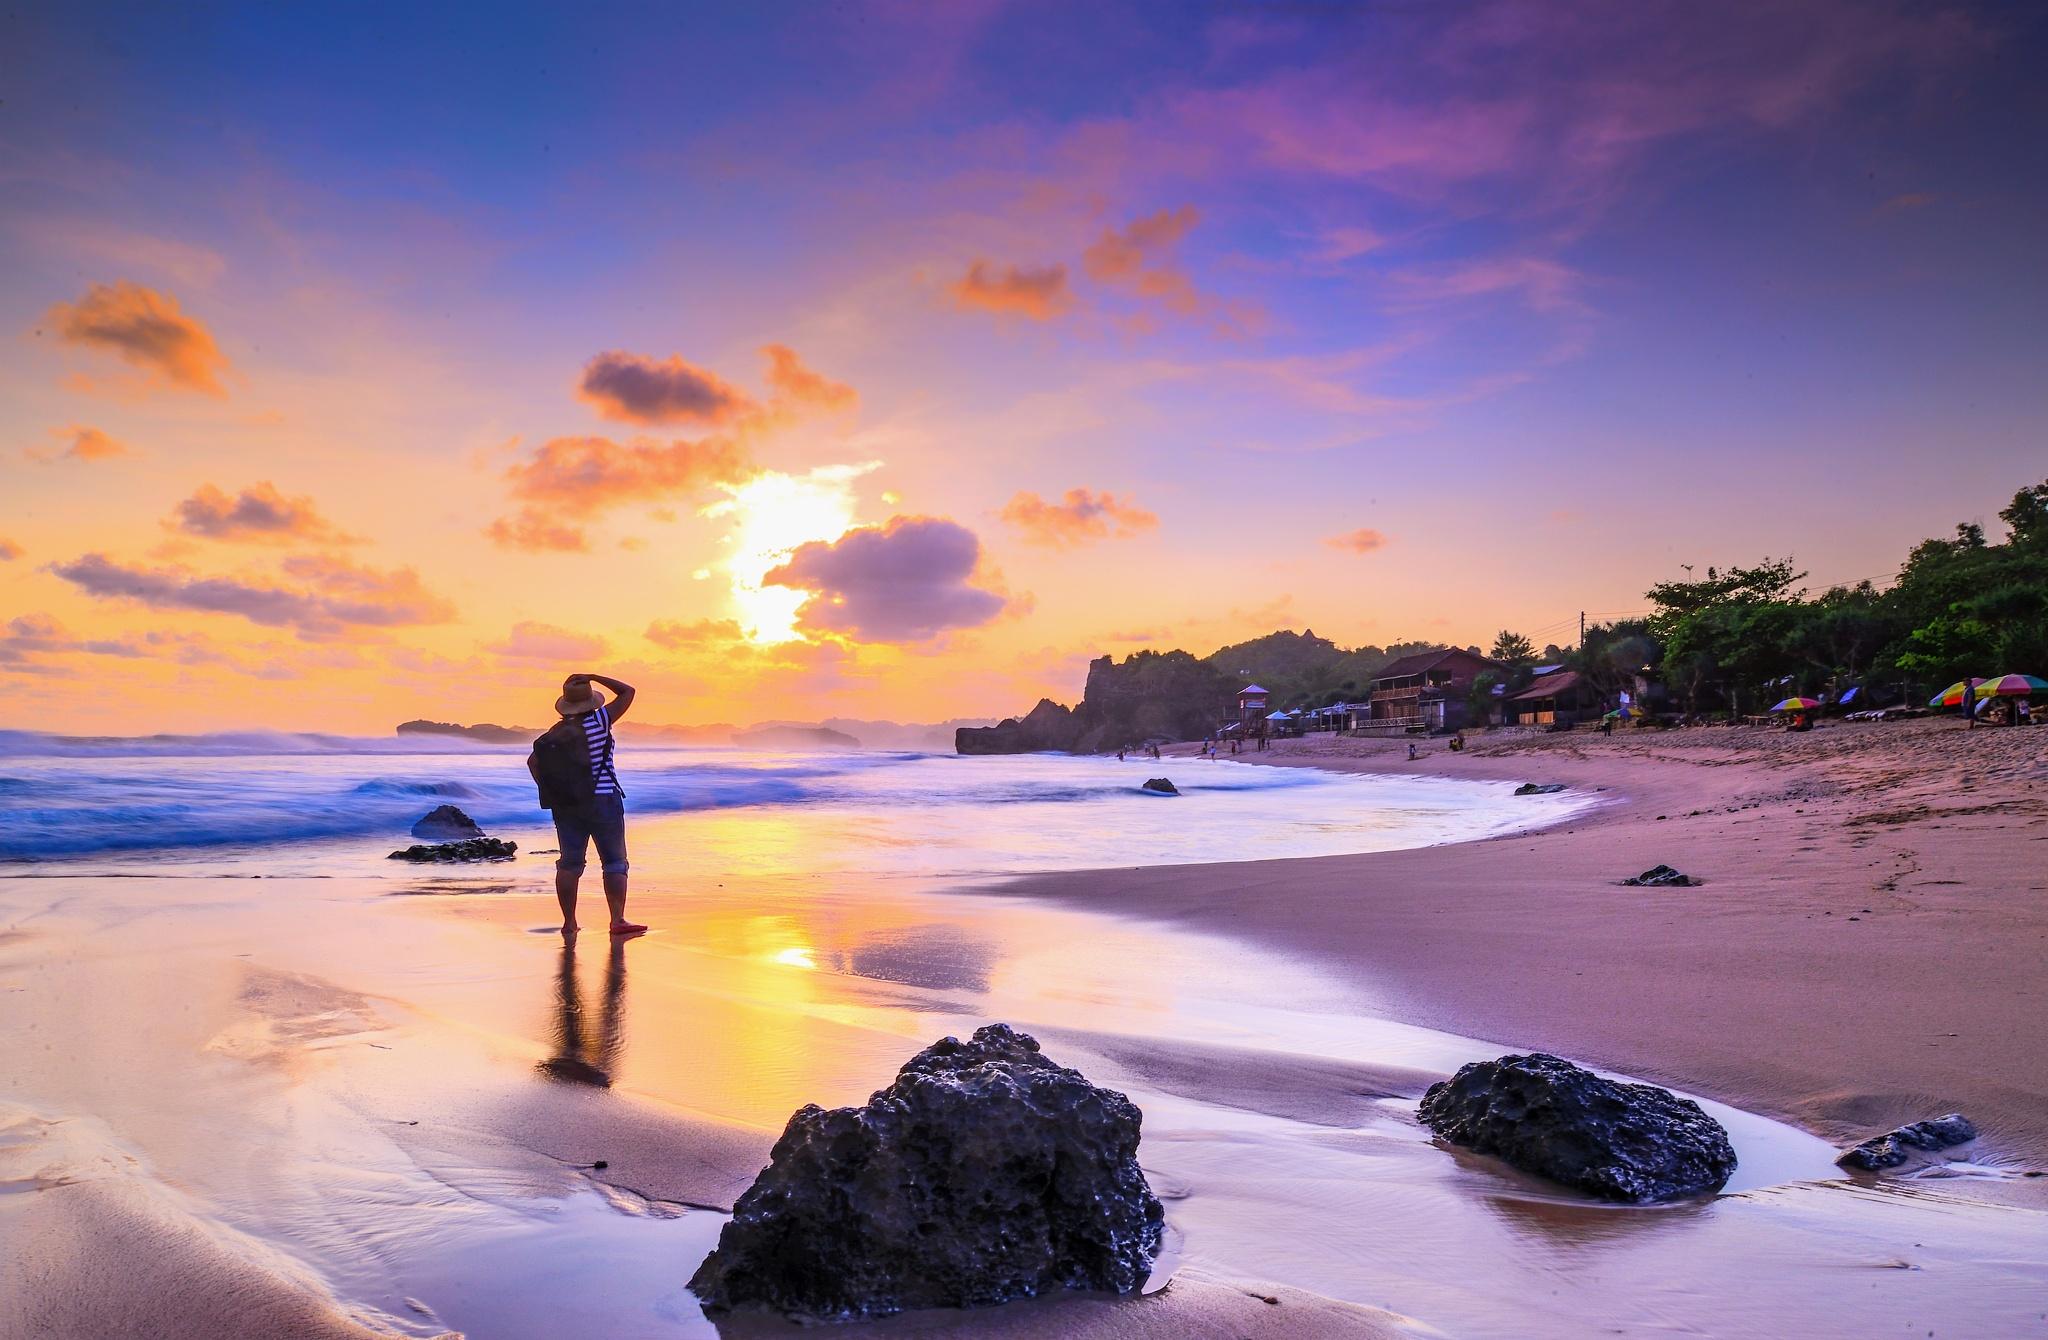 Twilight Indrayanti Beach by djerrybansaleng